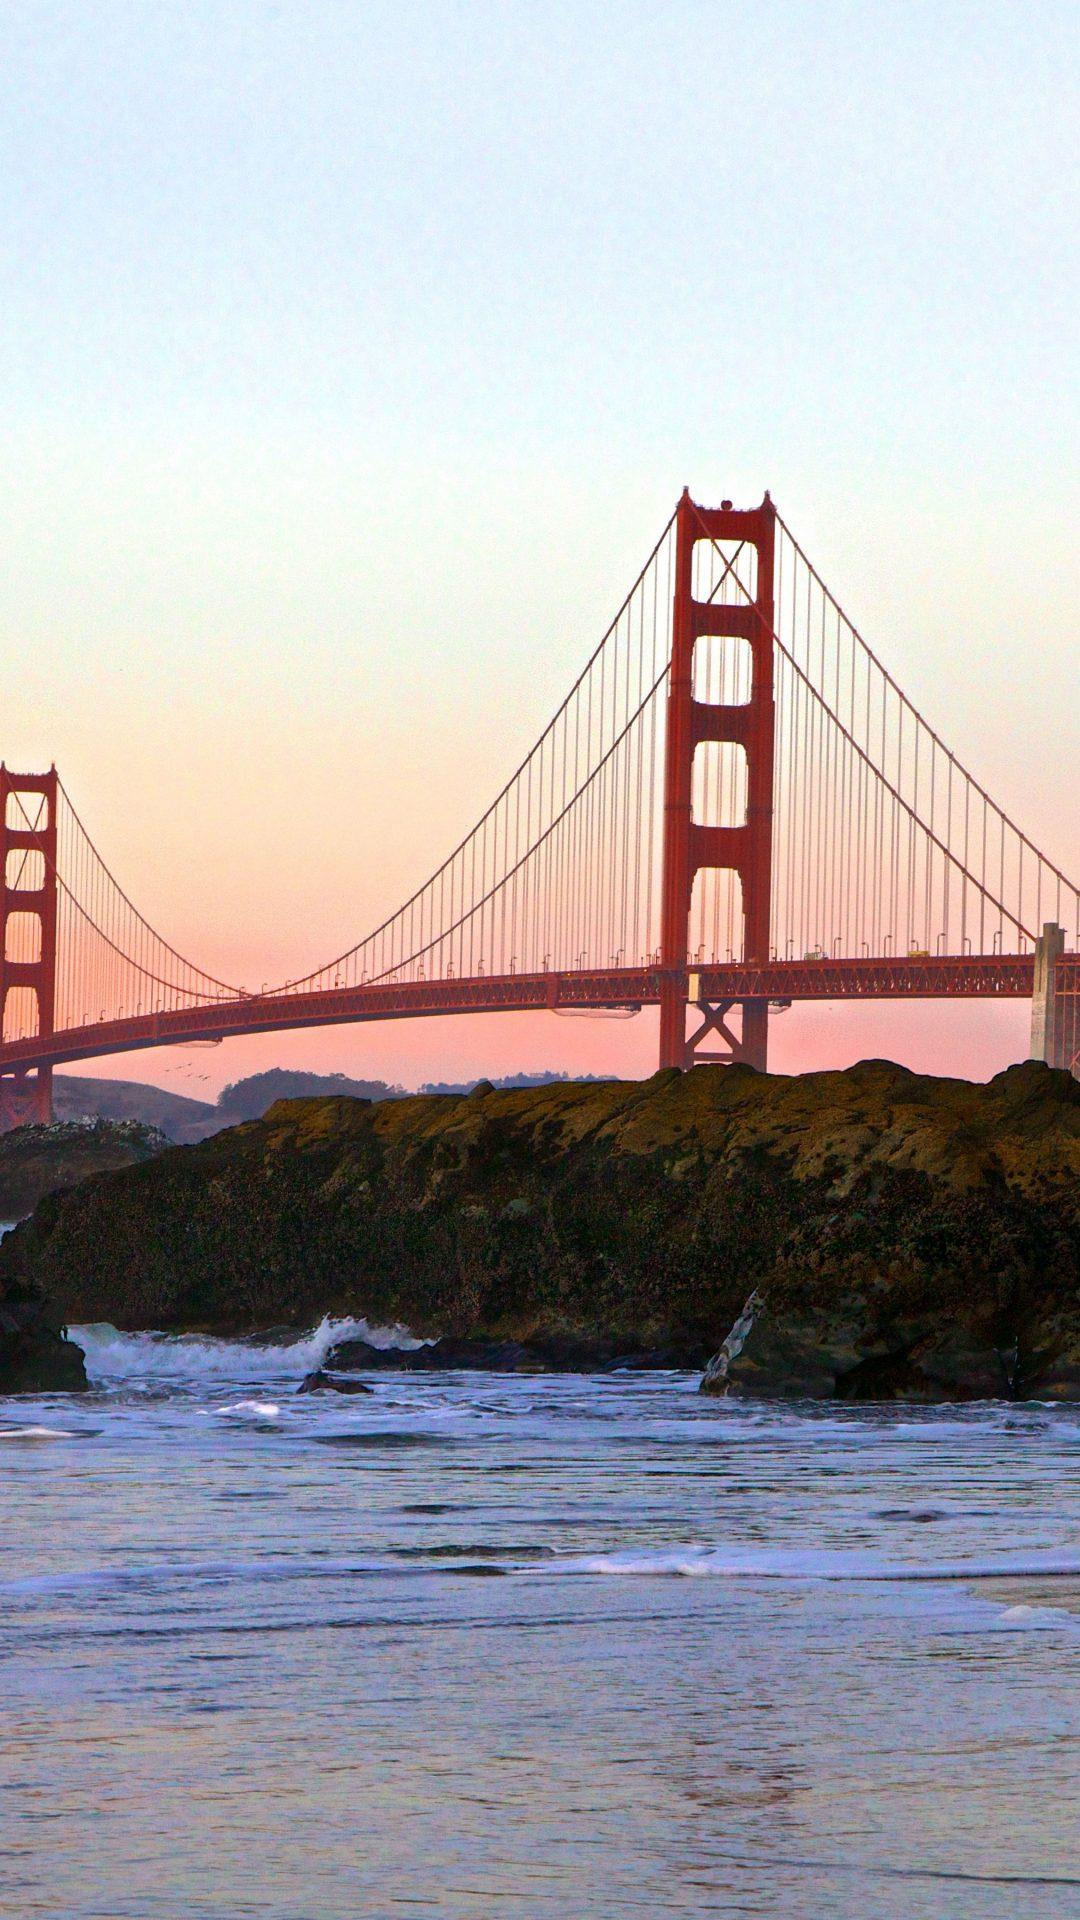 Golden Gate Bridge Usa 5k Uhd Wallpaper